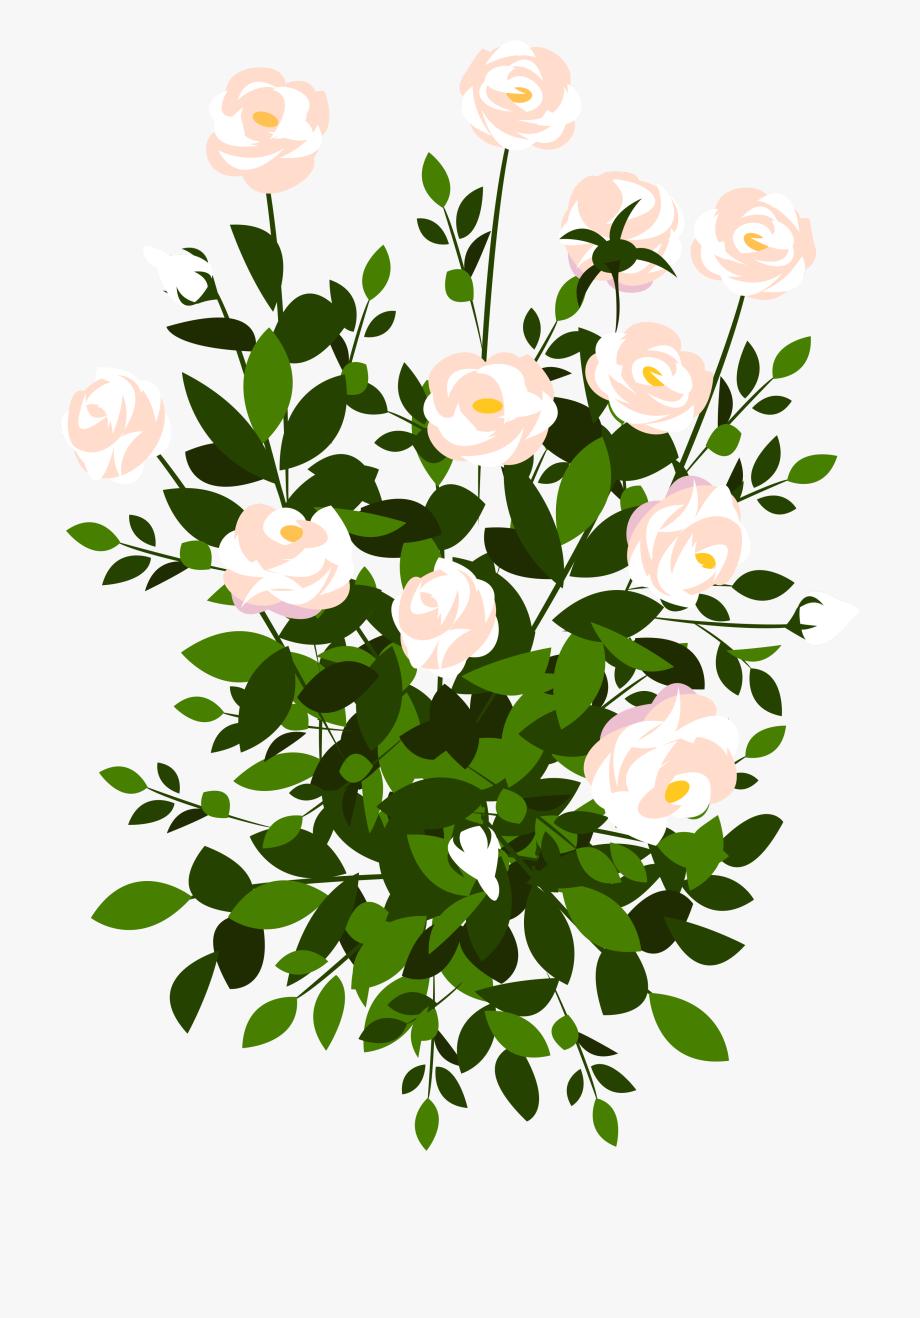 Bush clipart transparent flower. Whte png picture gallery